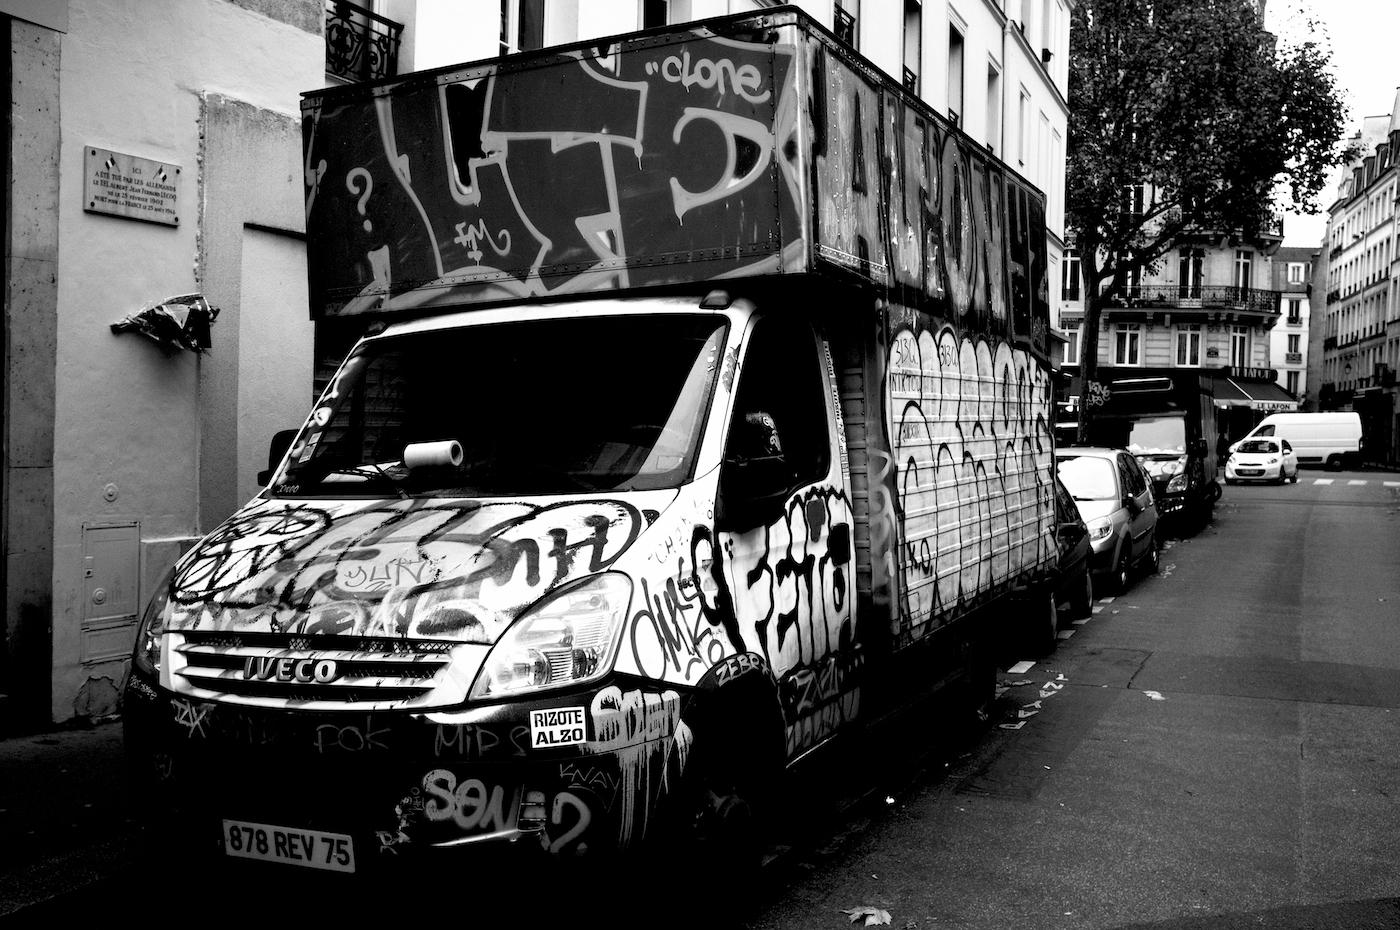 161126-marcvallee-Graffiti-Trucks-26.11.16.0066